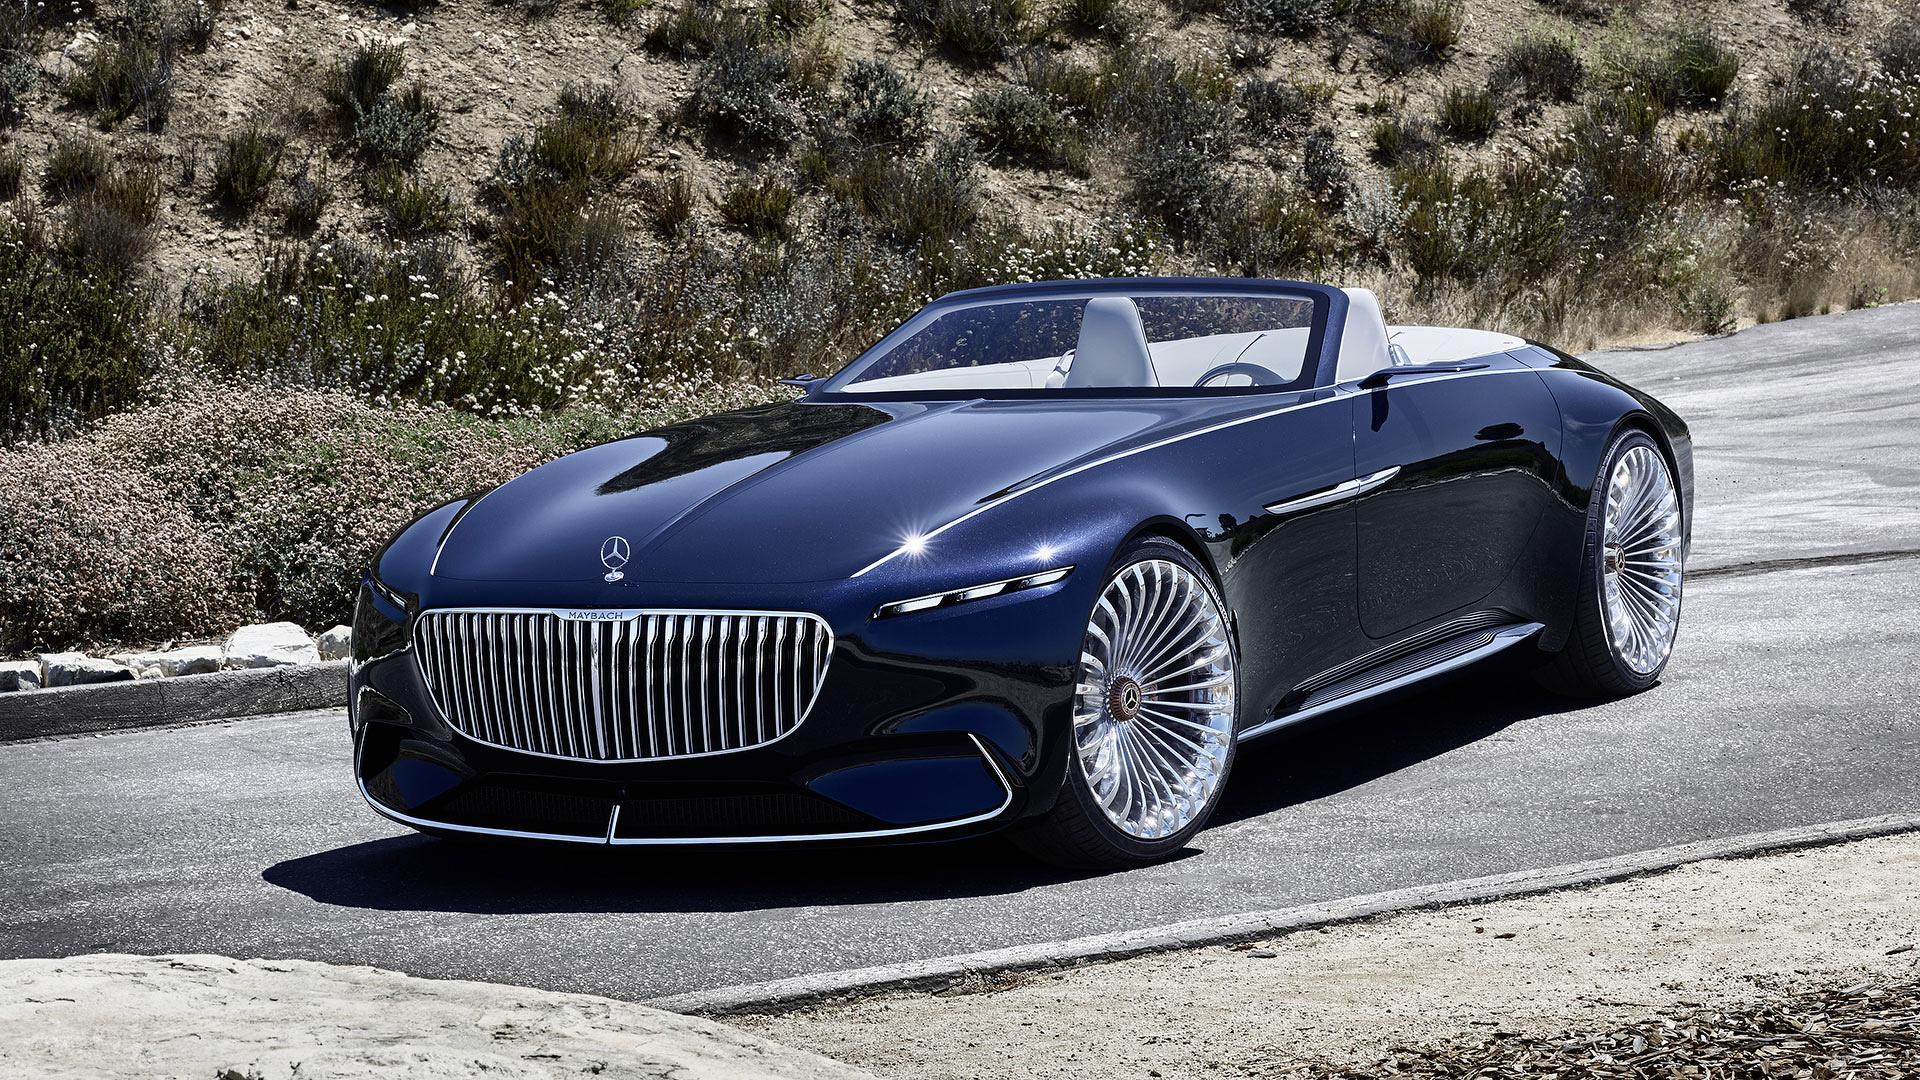 vision mercedes maybach 6 cabriolet luxueuse lectrique. Black Bedroom Furniture Sets. Home Design Ideas